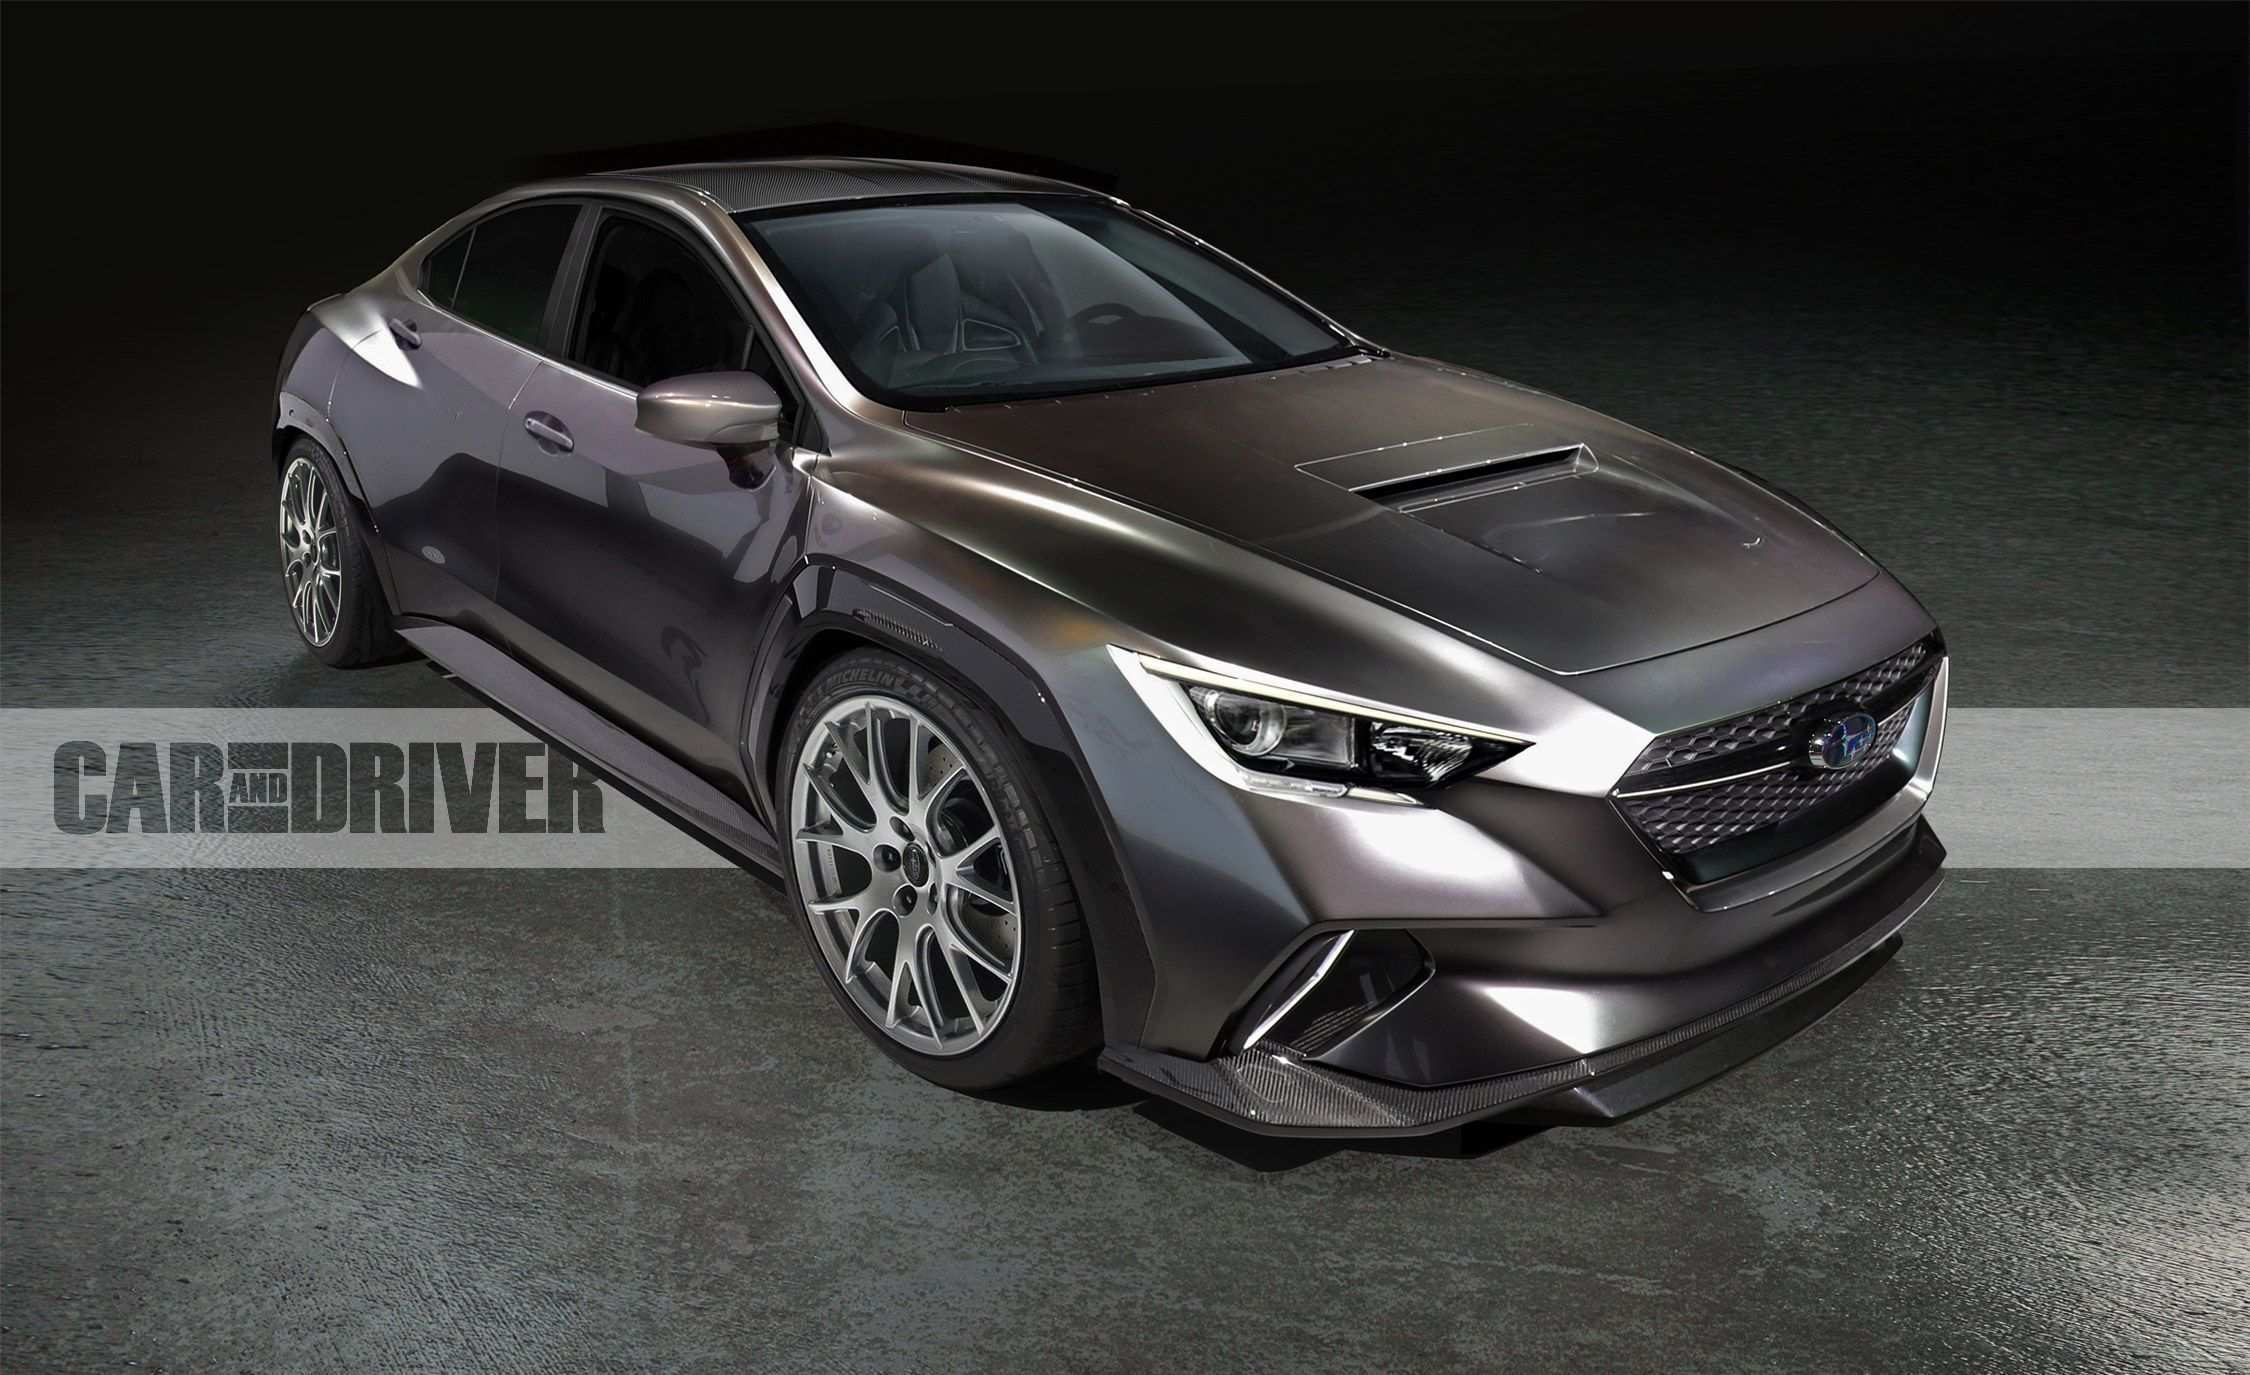 2020 Wrx Review.49 Best Review 2020 Subaru Impreza Wrx Performance And New